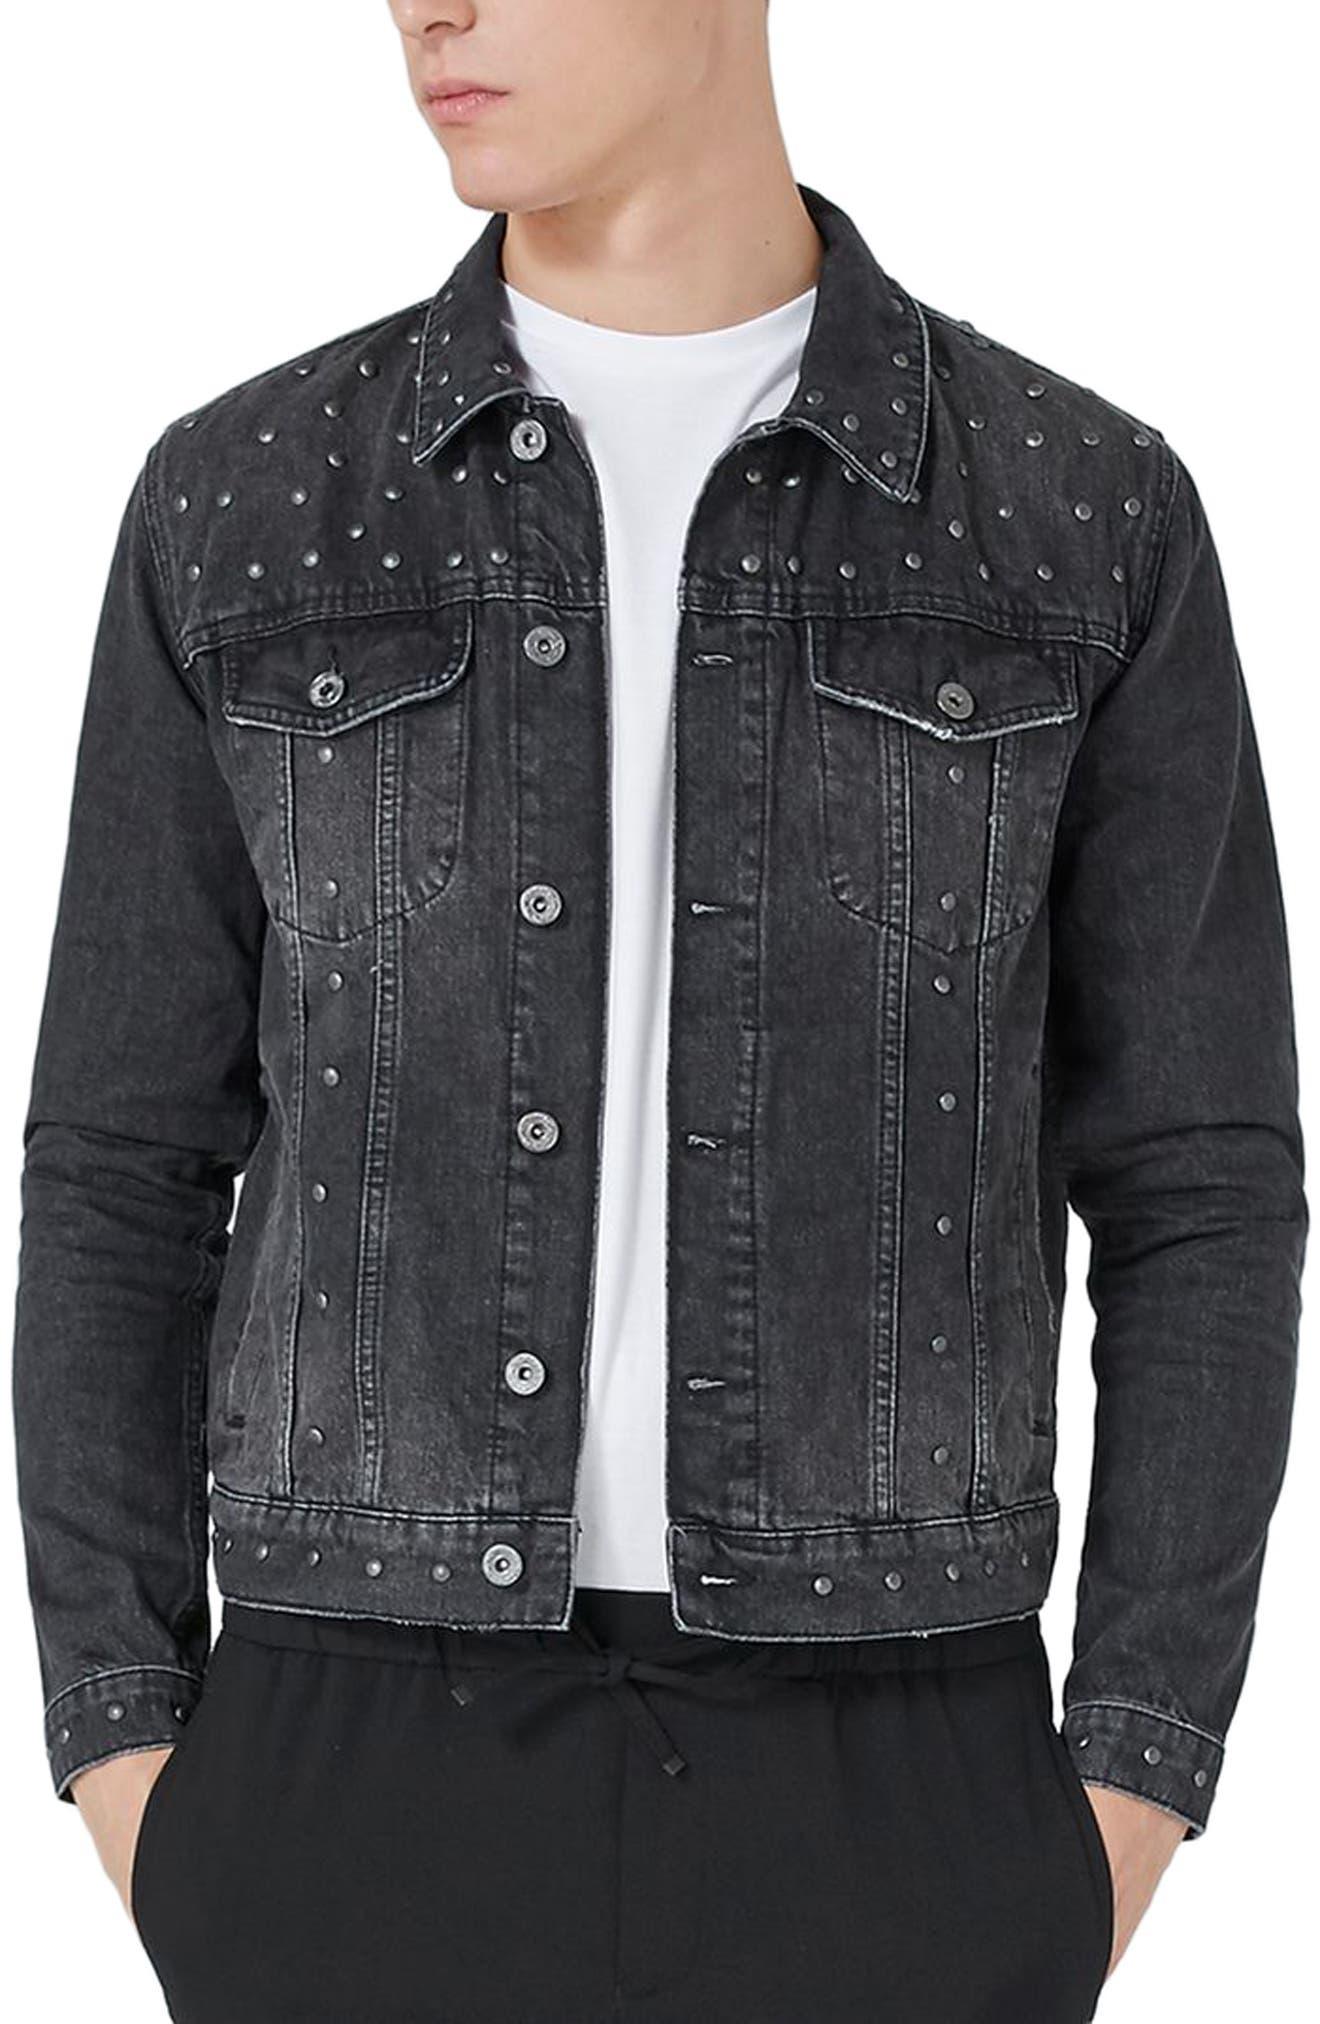 Studded Denim Jacket,                             Main thumbnail 1, color,